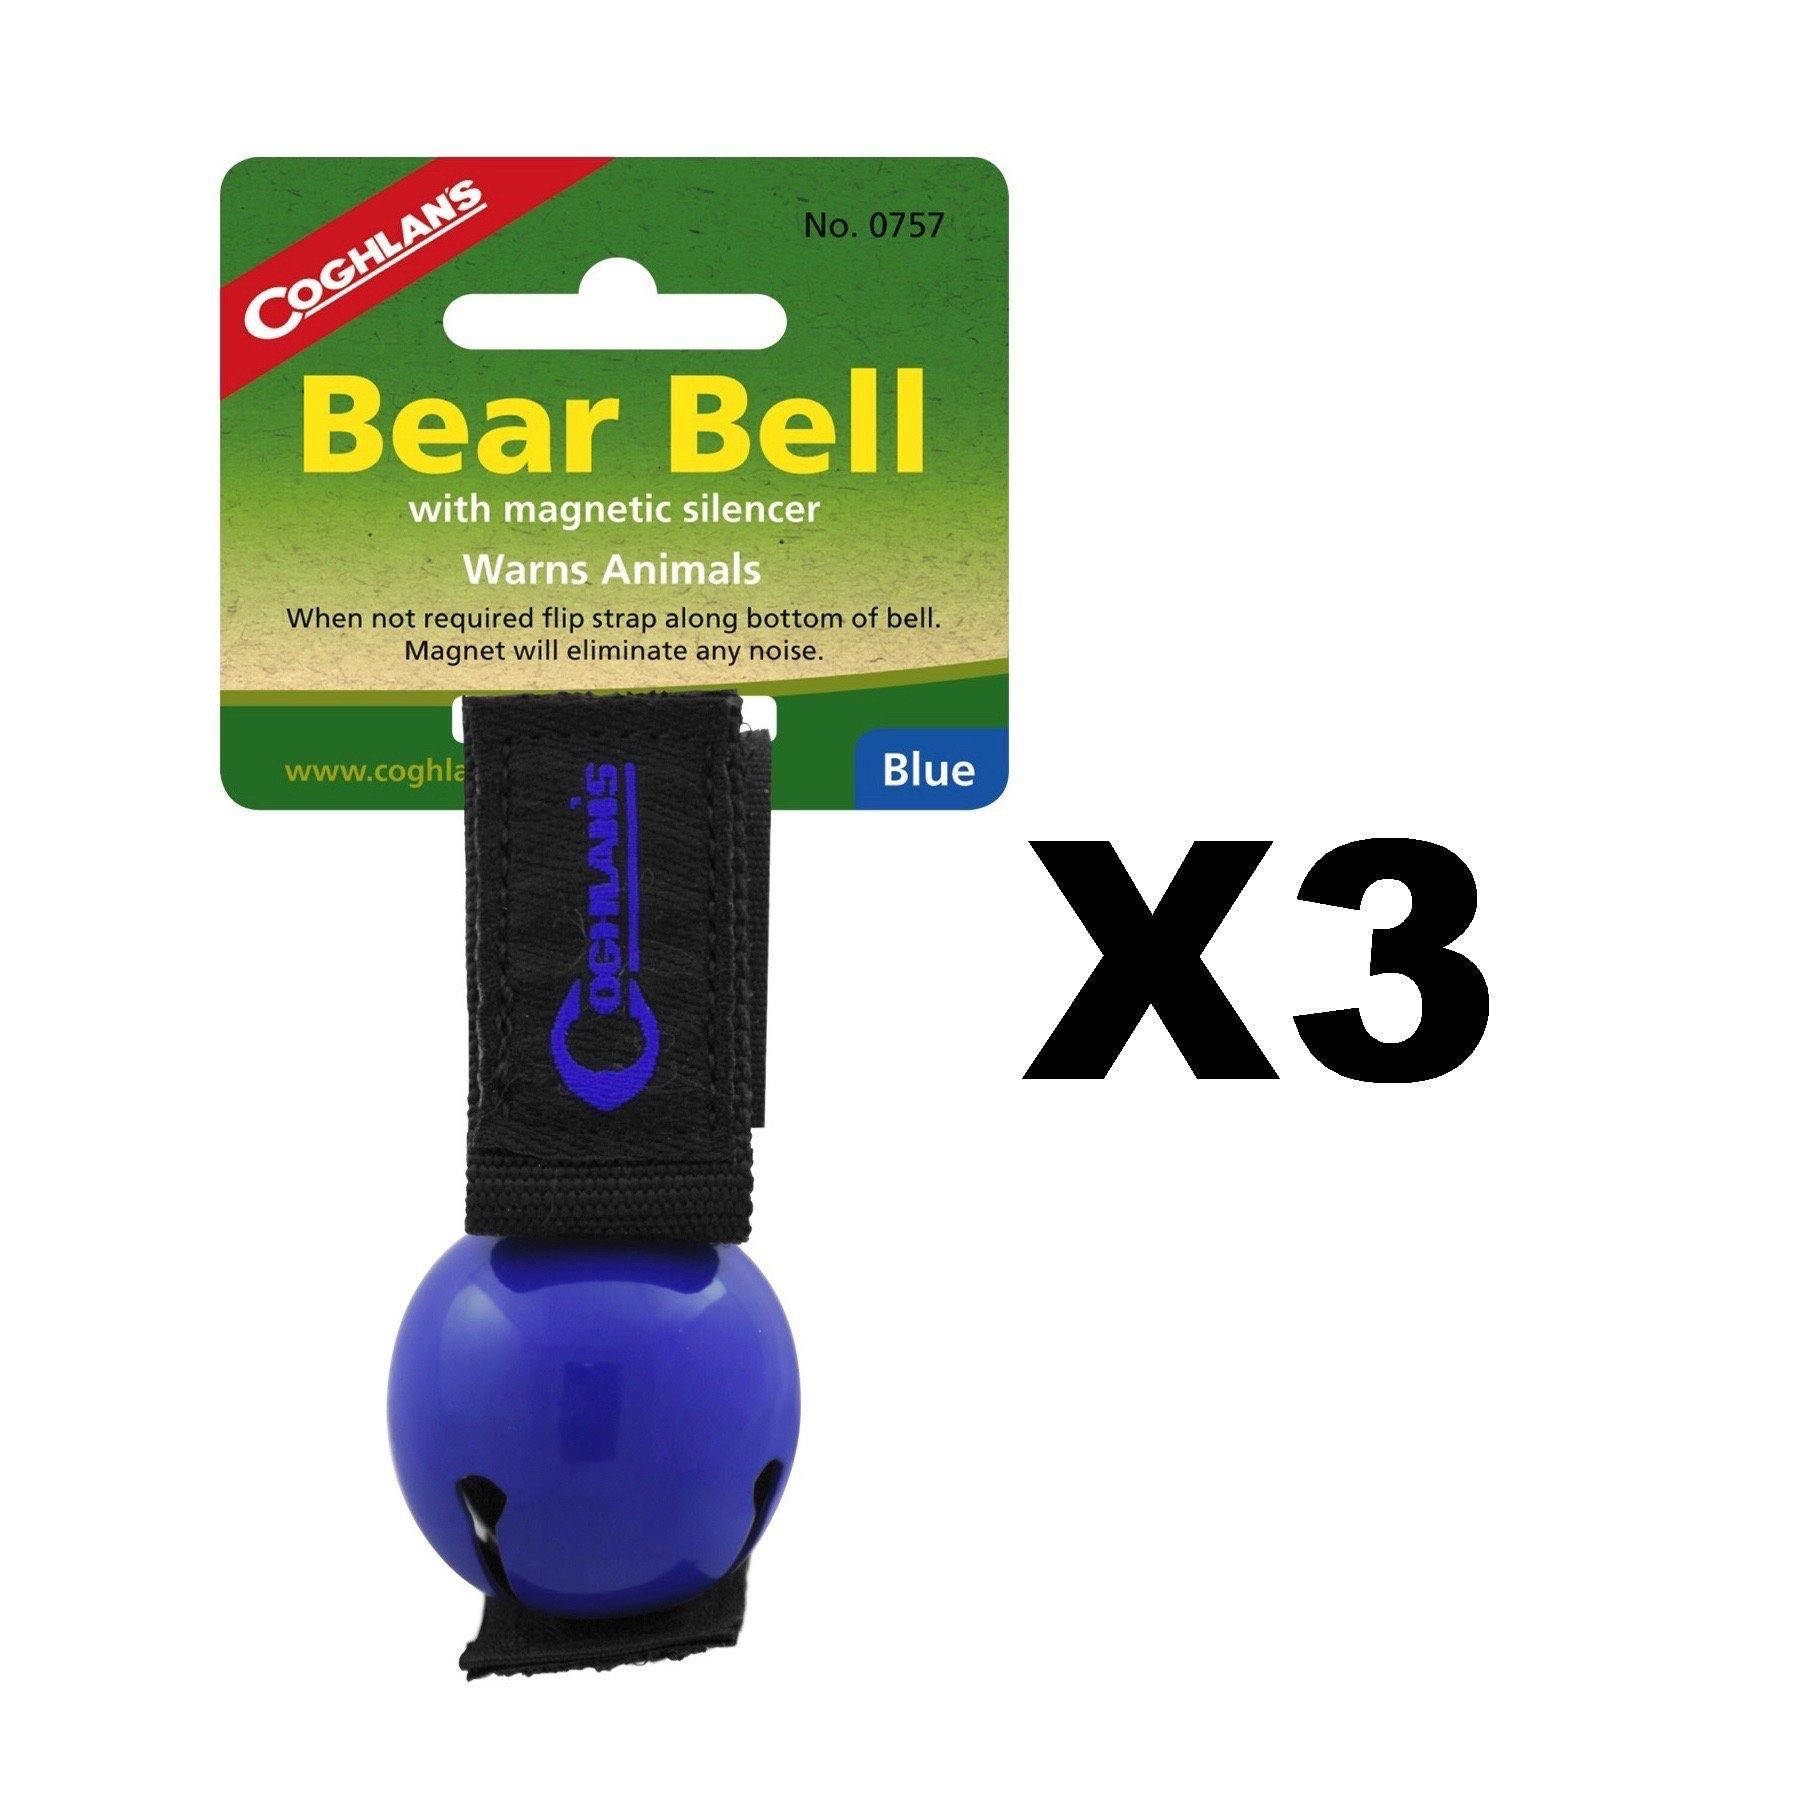 Coghlan's Bear Bell Blue w/Magnetic Silencer & Loop Strap Warns Animals (3-Pack)